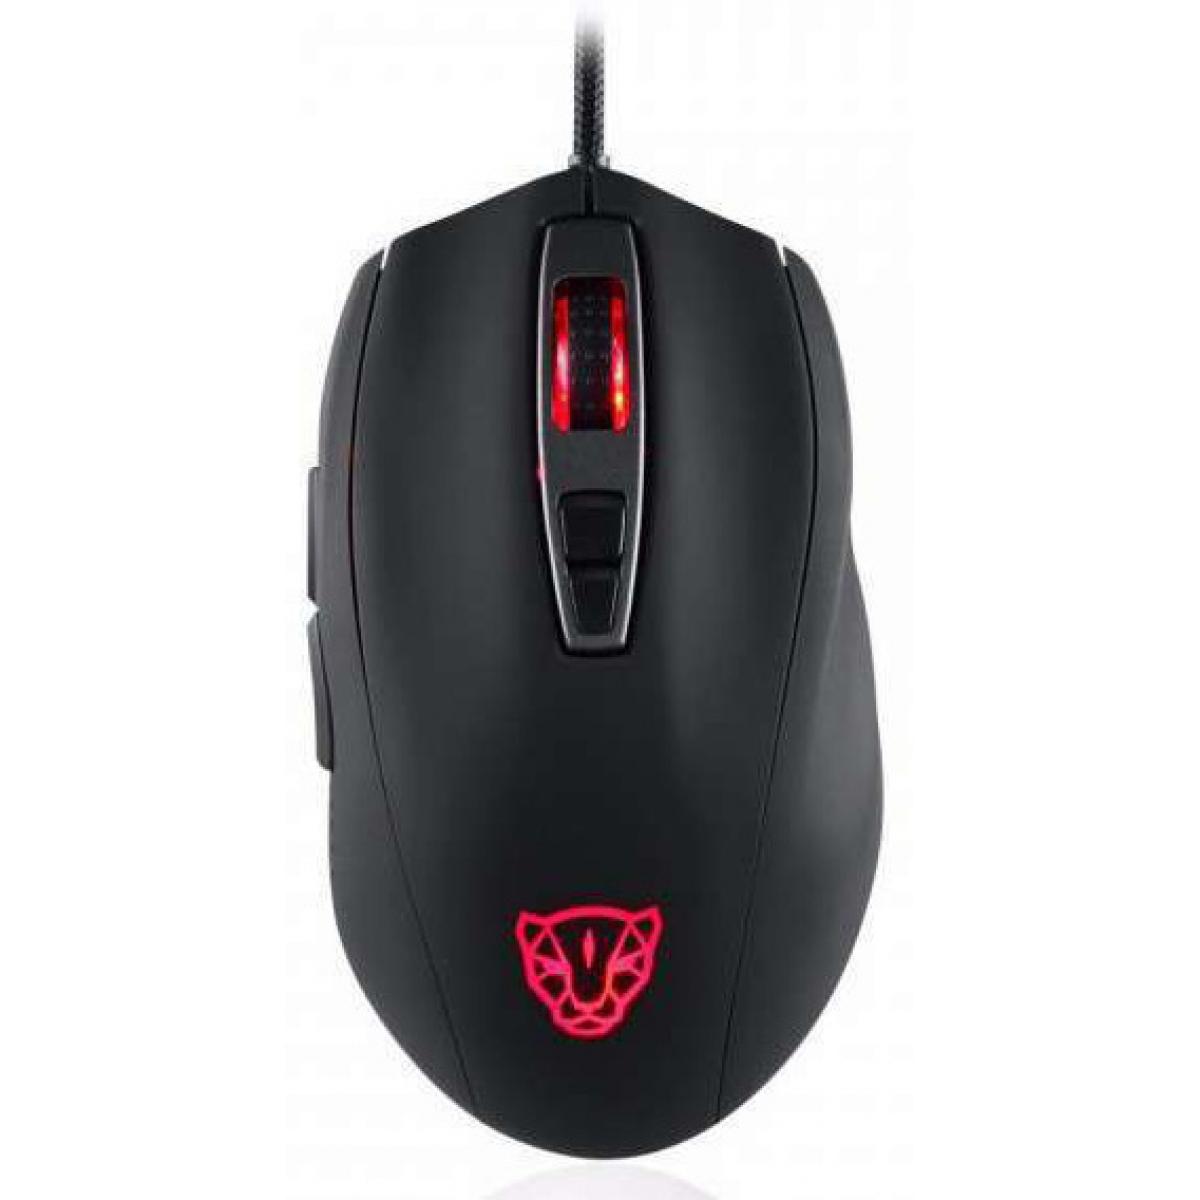 Mouse Gamer Motospeed V60 7 Botões 5000 DPI RGB, Black, FMSMS0006PTO